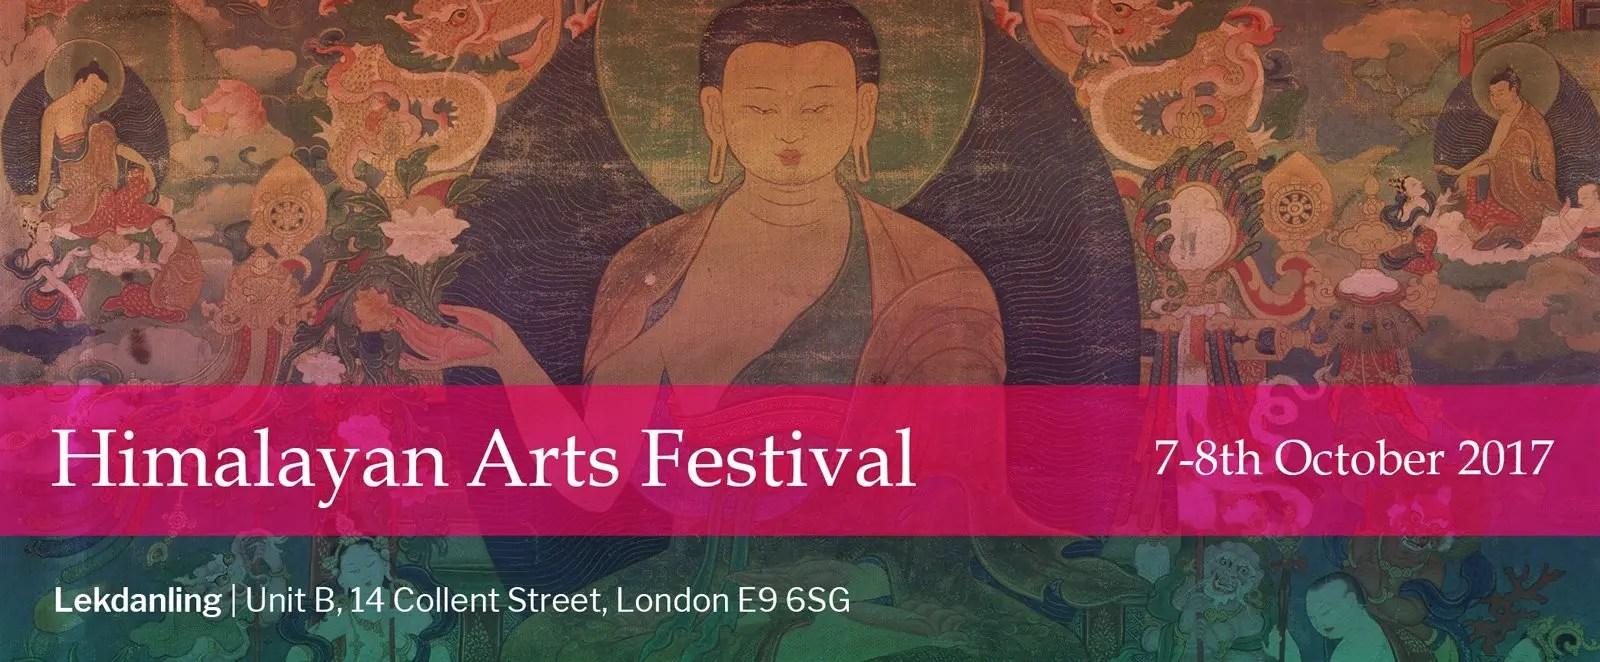 himalayan-arts-festival